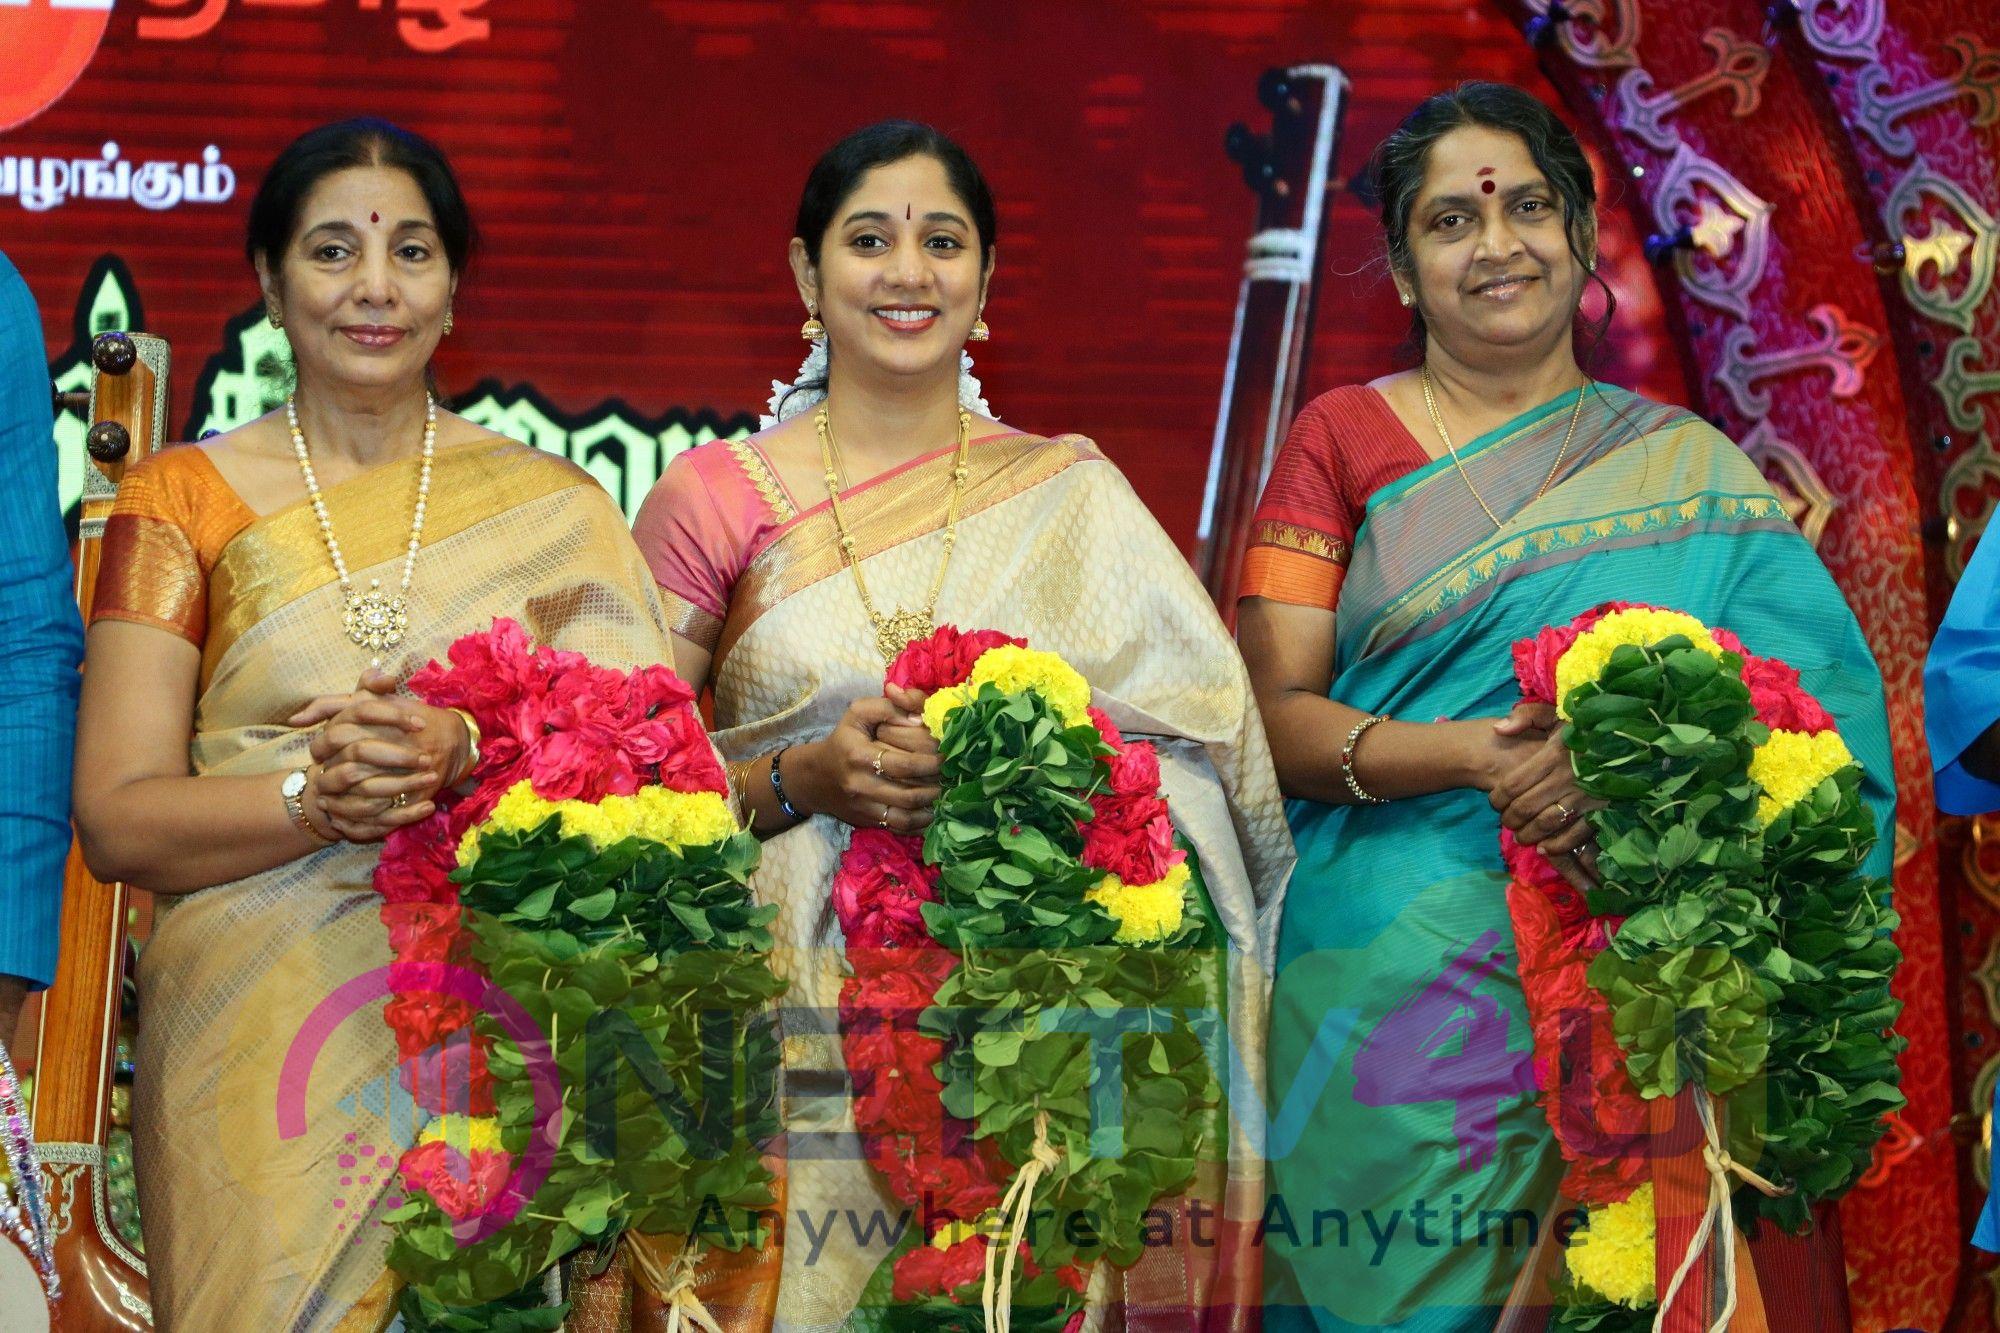 Chennaiyil Thiruvaiyaru Season 13 - Day 3 Images